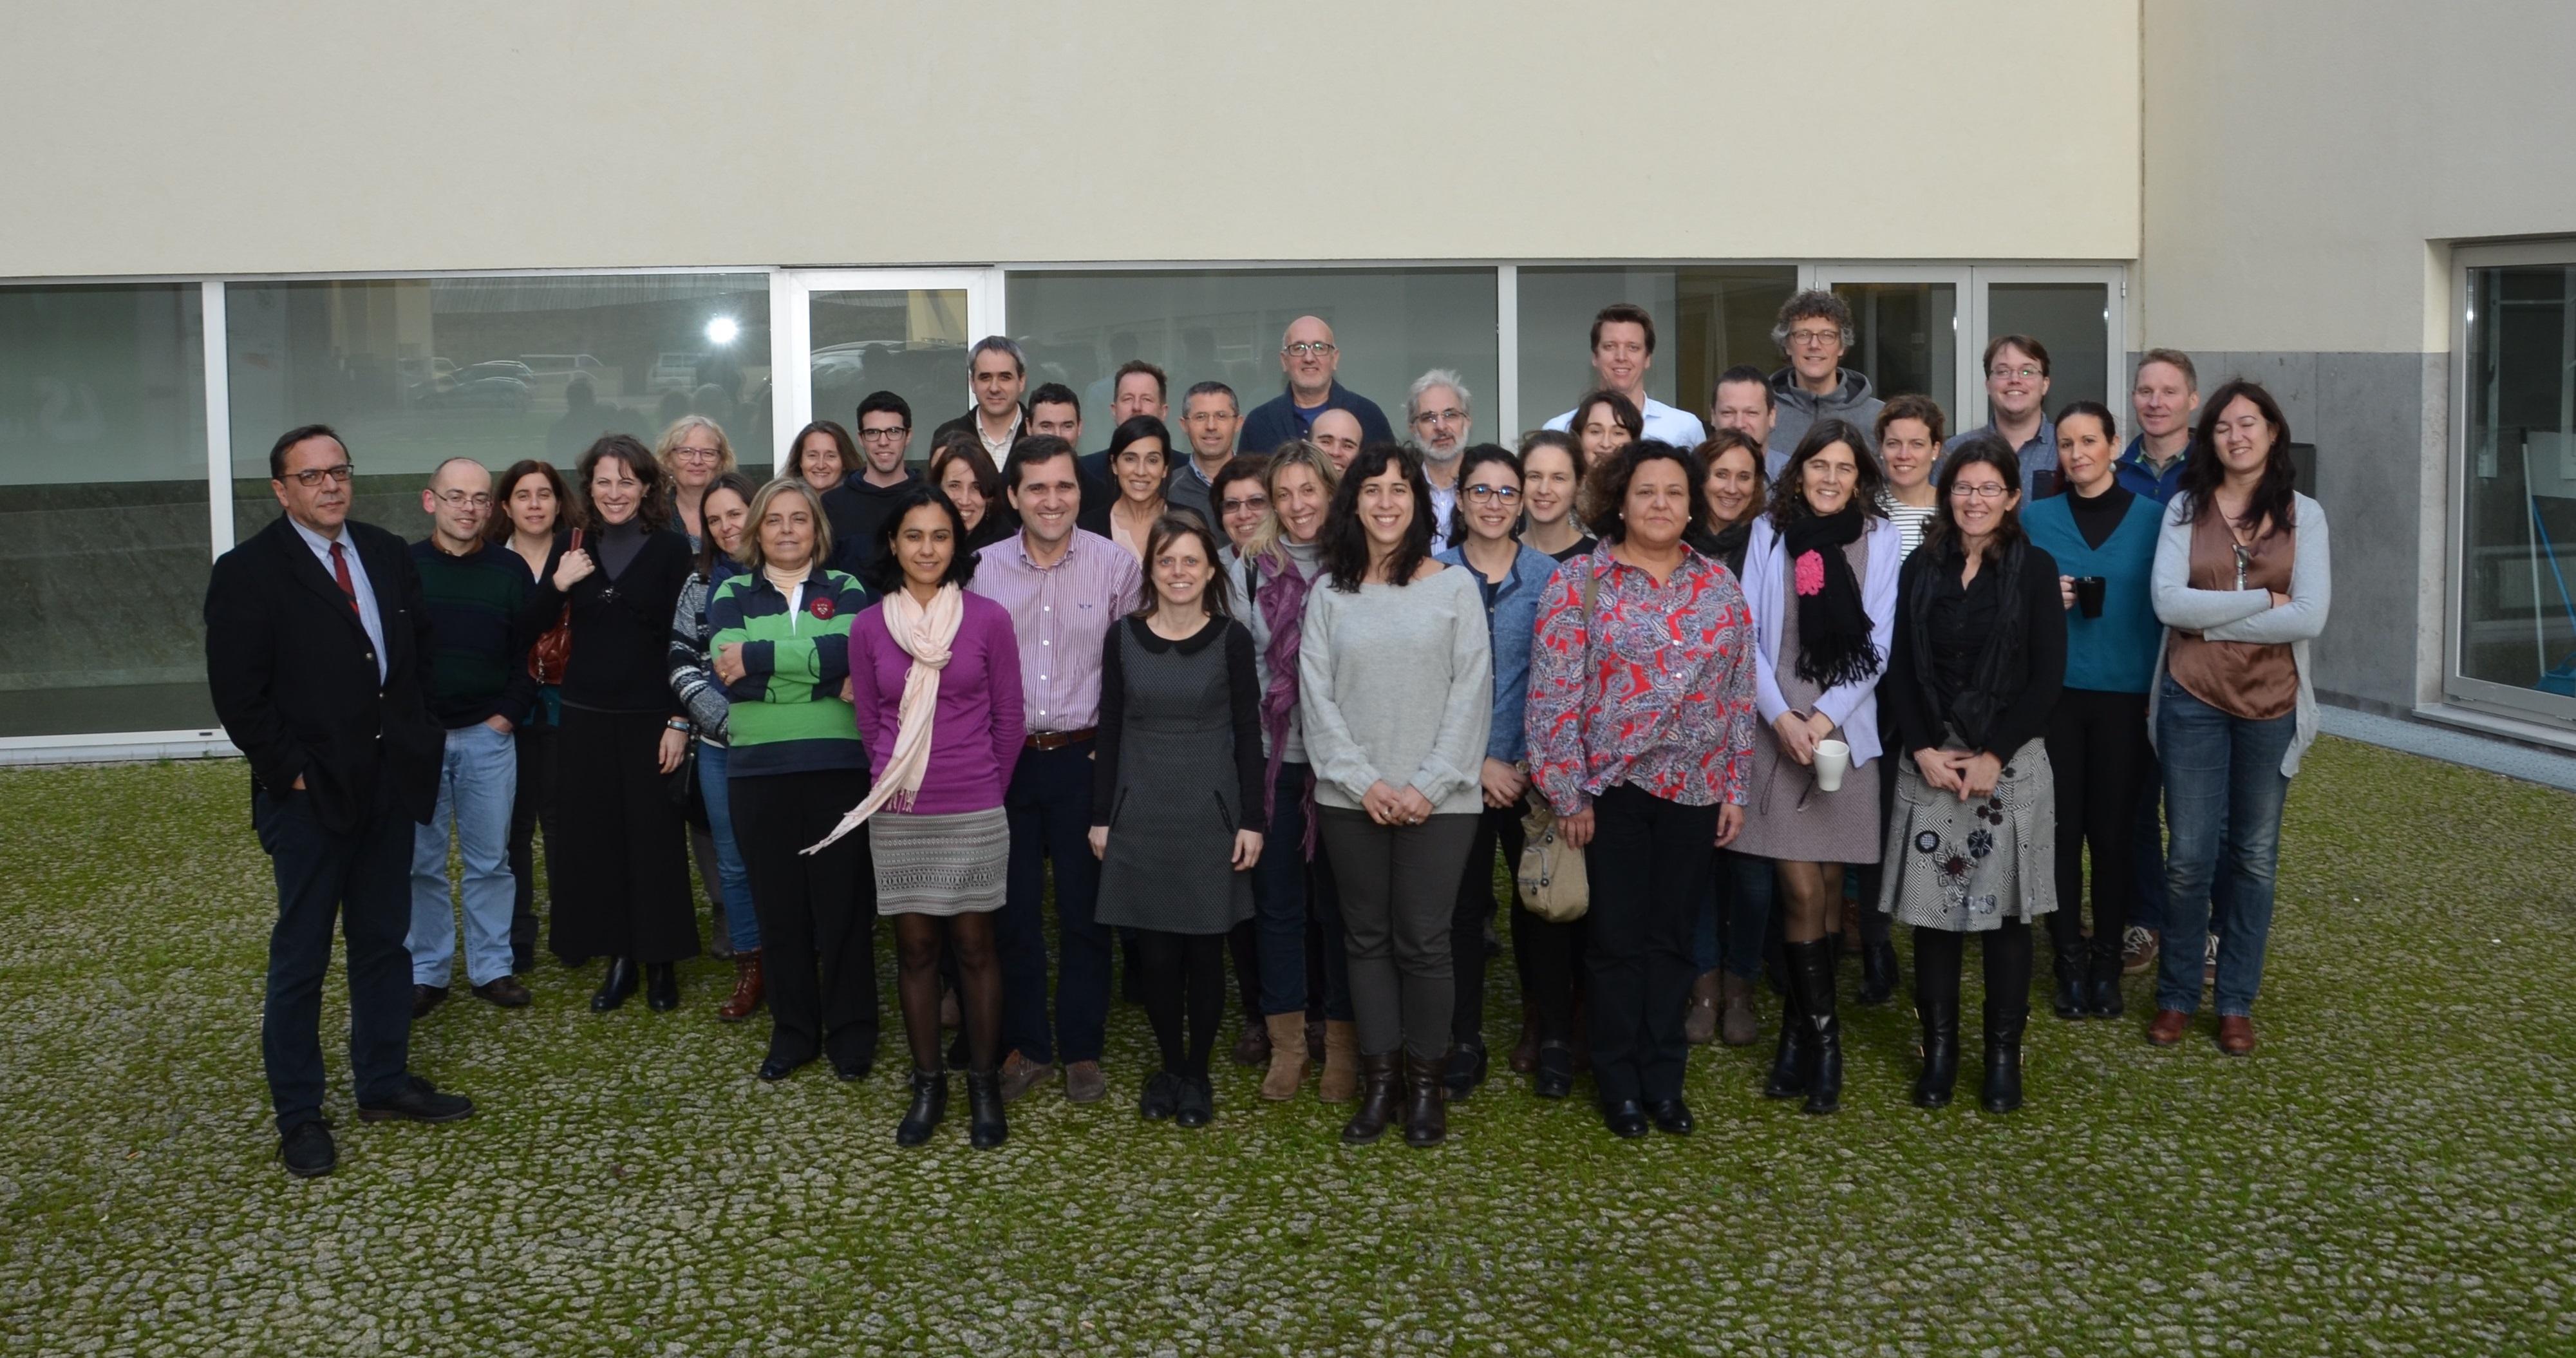 Porto meeting group photo